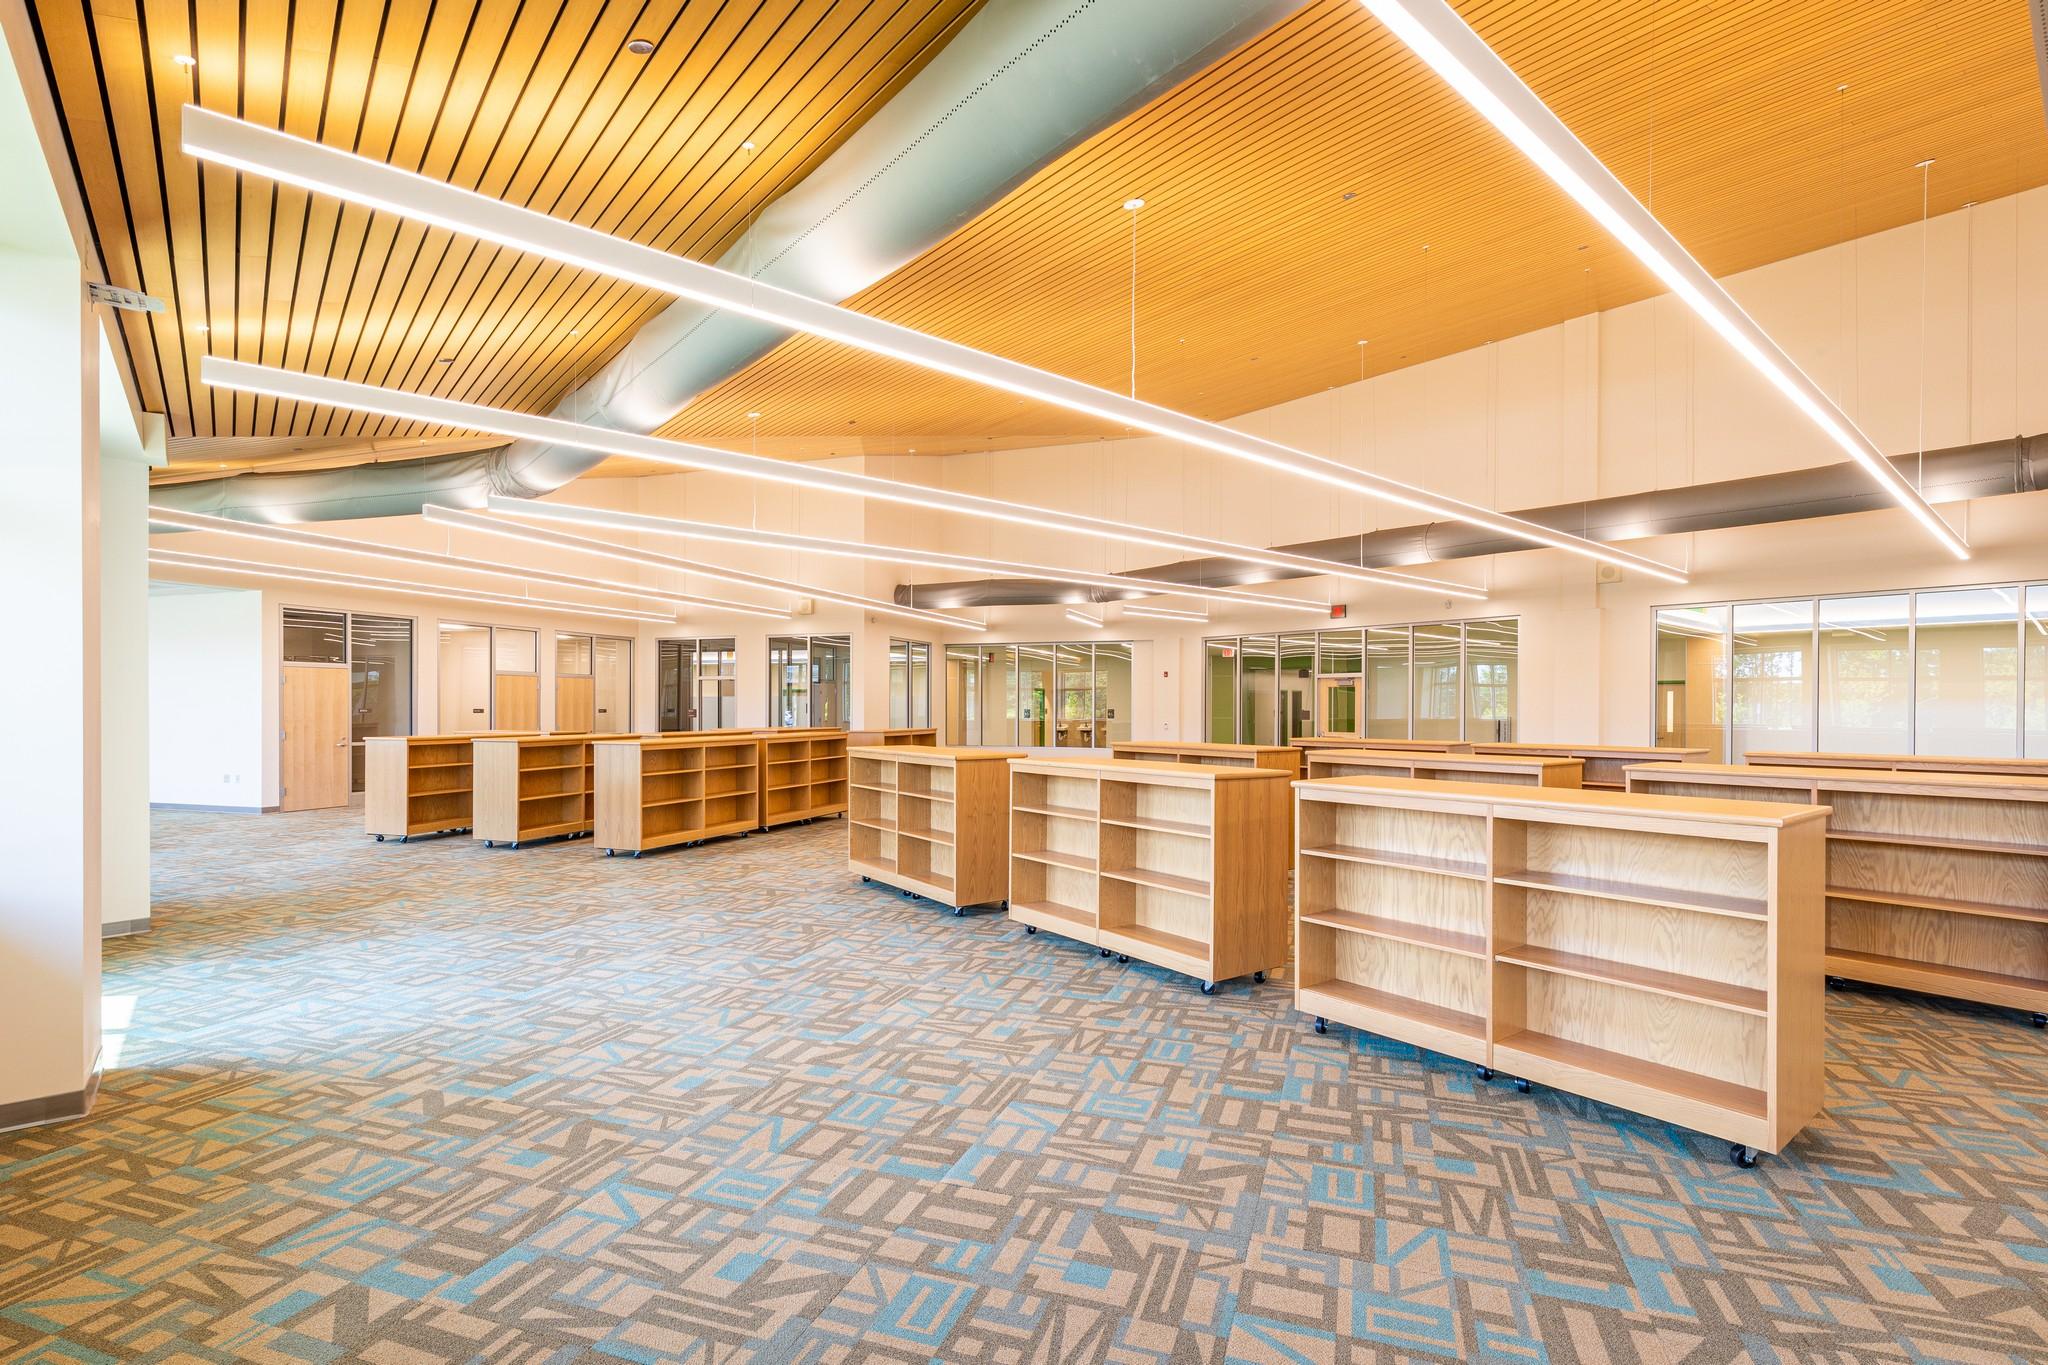 Chatham Grove Elementary School